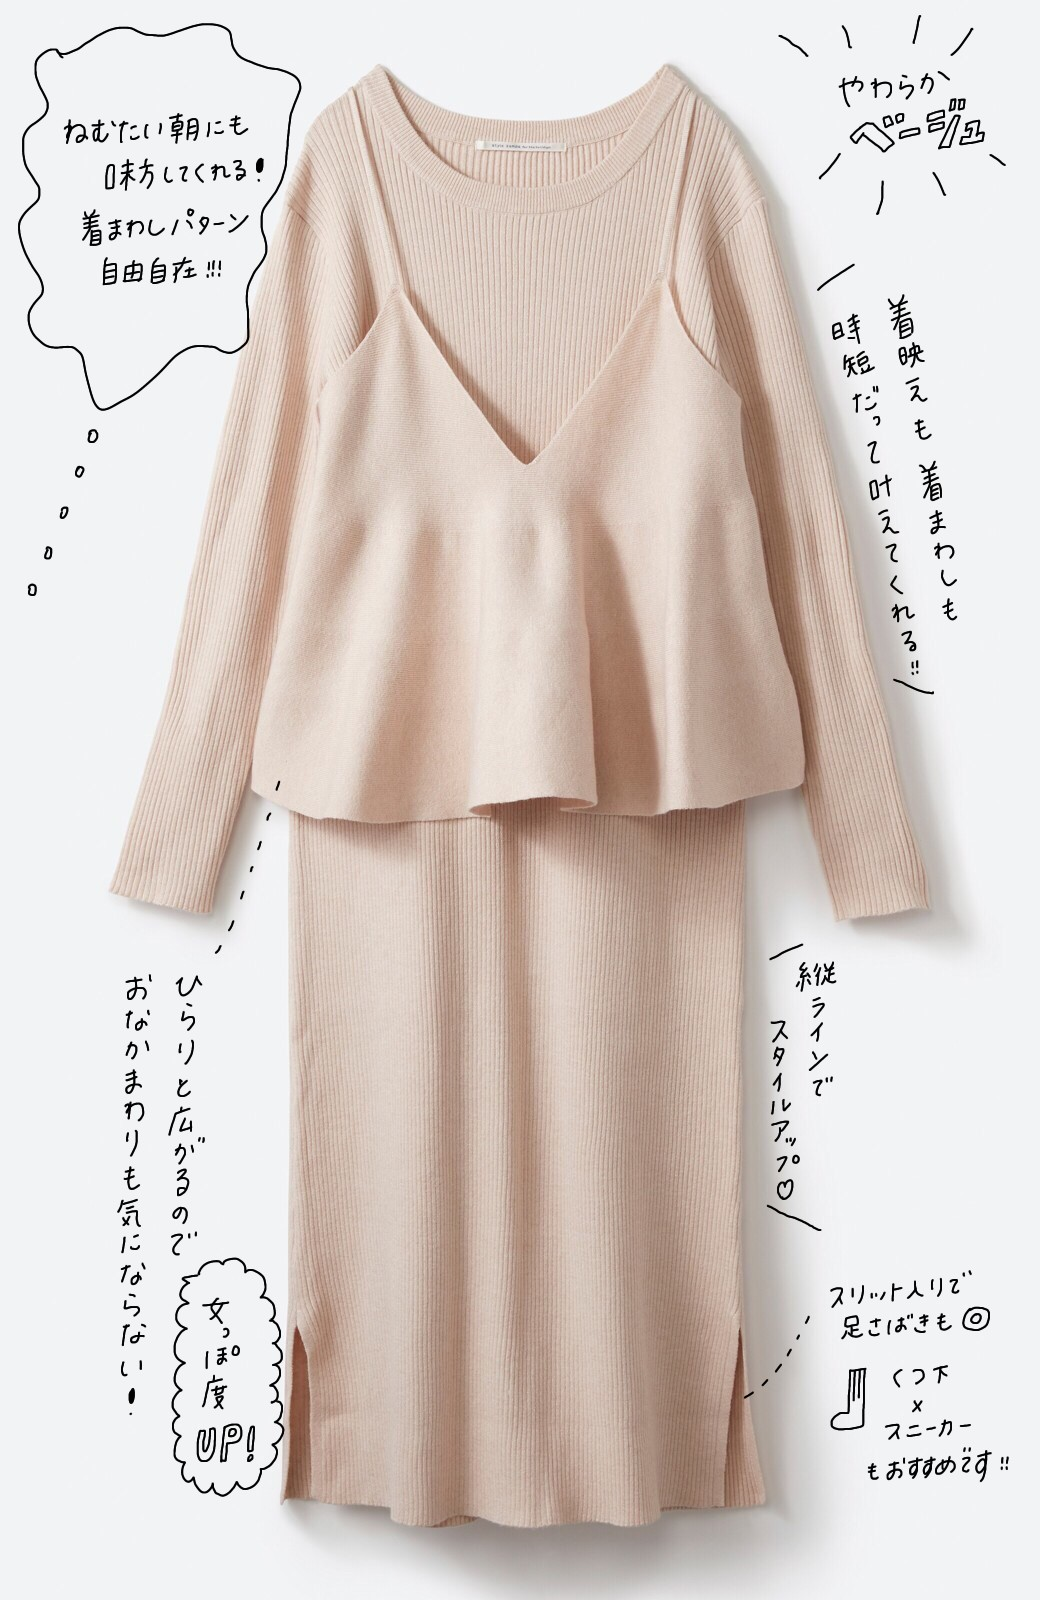 haco! ニットワンピースとキャミソールを重ねて着るだけでパッとオシャレに見えるうれしいセット by style zampa <ライトベージュ>の商品写真2